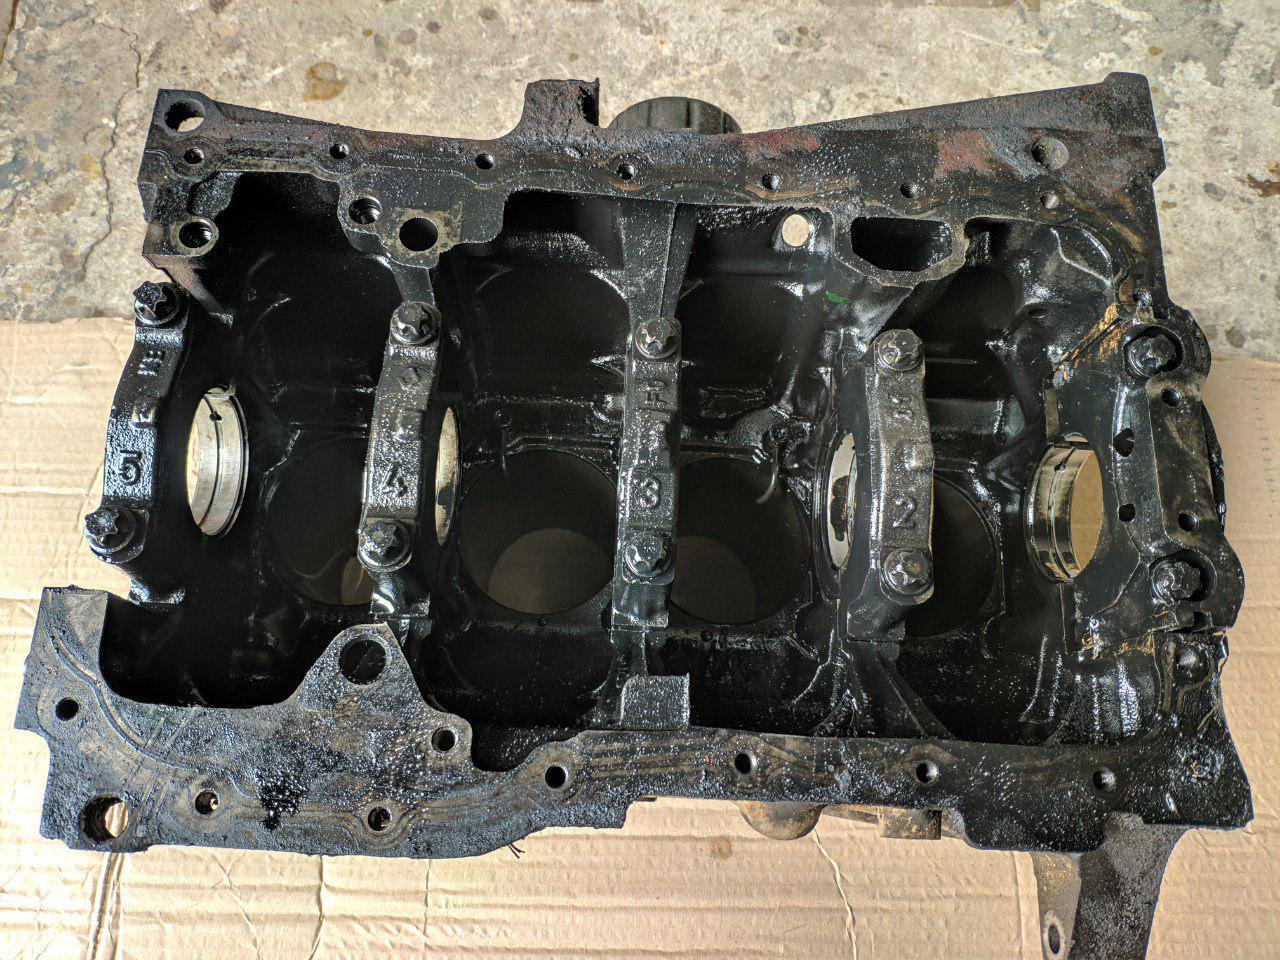 Блок цилиндров (голый) Renault Trafic, Opel Vivaro 1.9, 2001-2006, 7701478529 (Б/У)